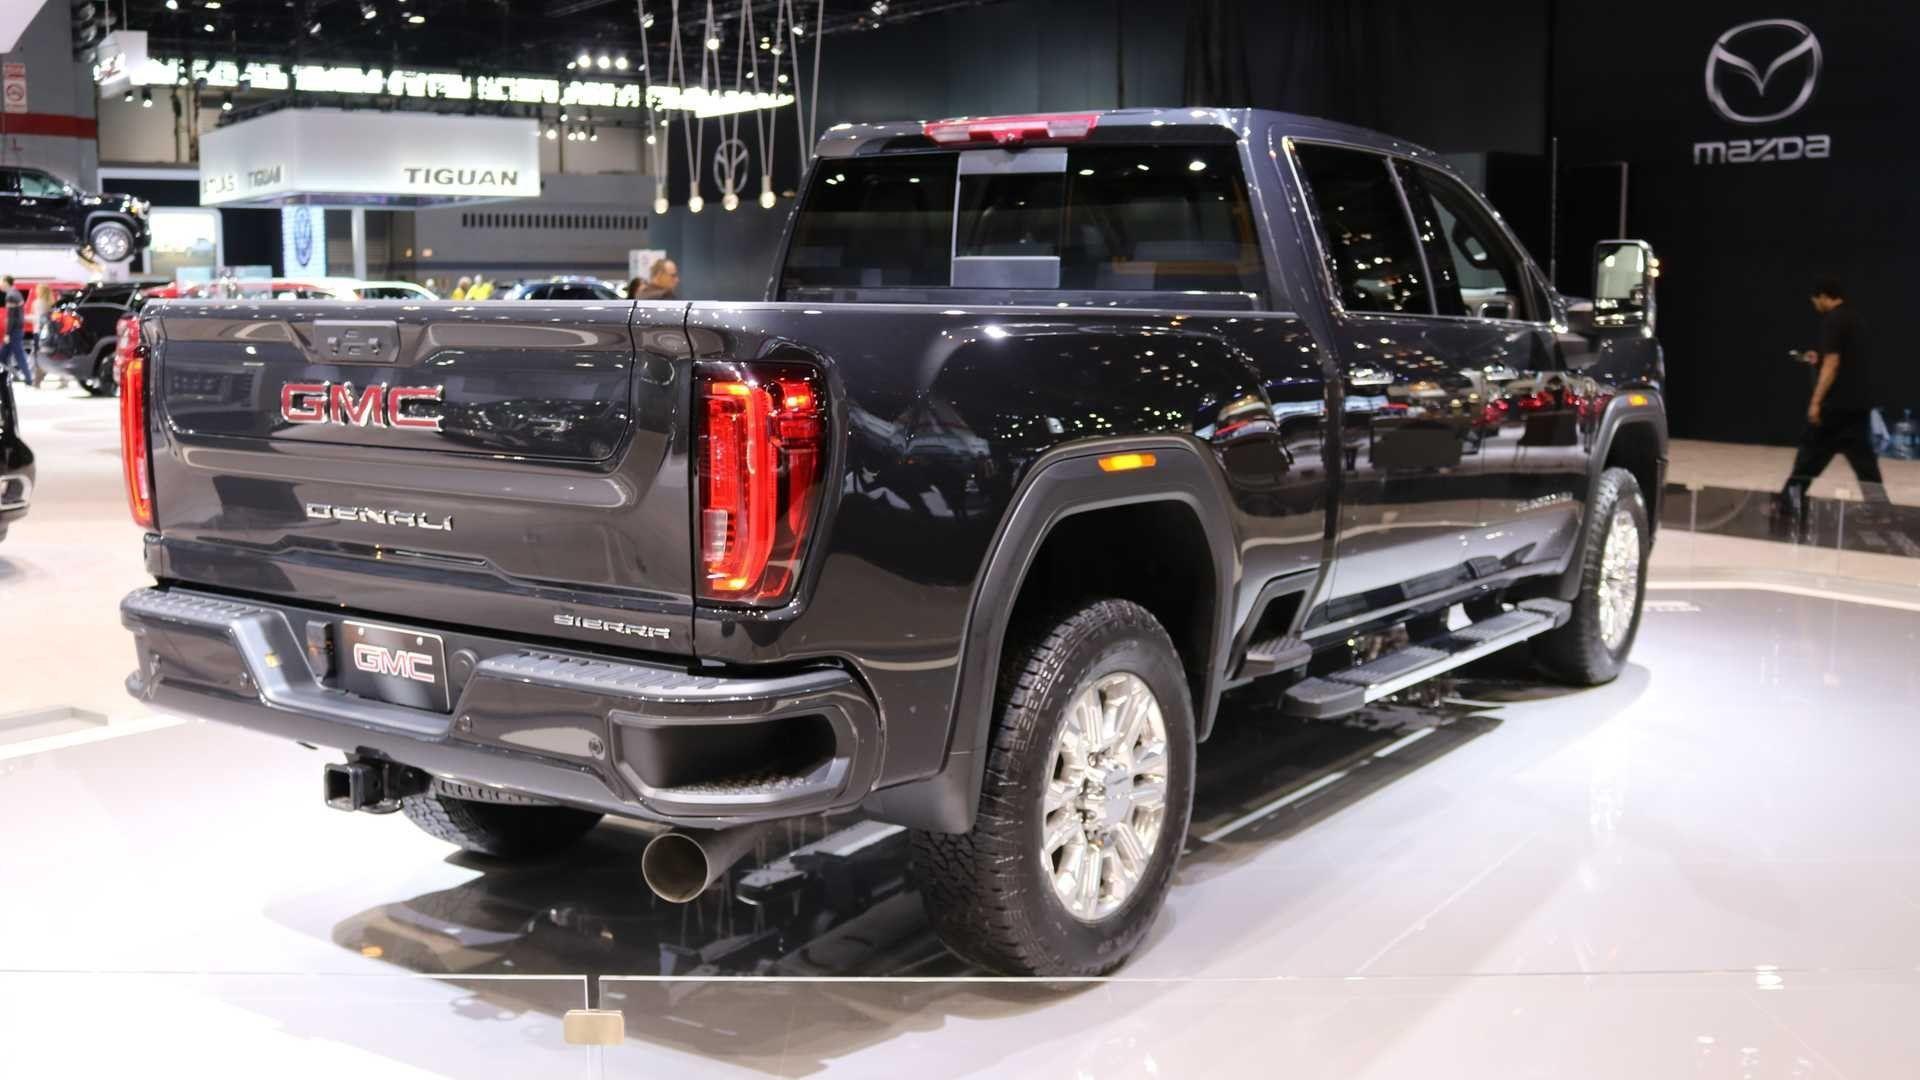 2020 Gmc Sierra 1500 Diesel Performance And New Engine In 2020